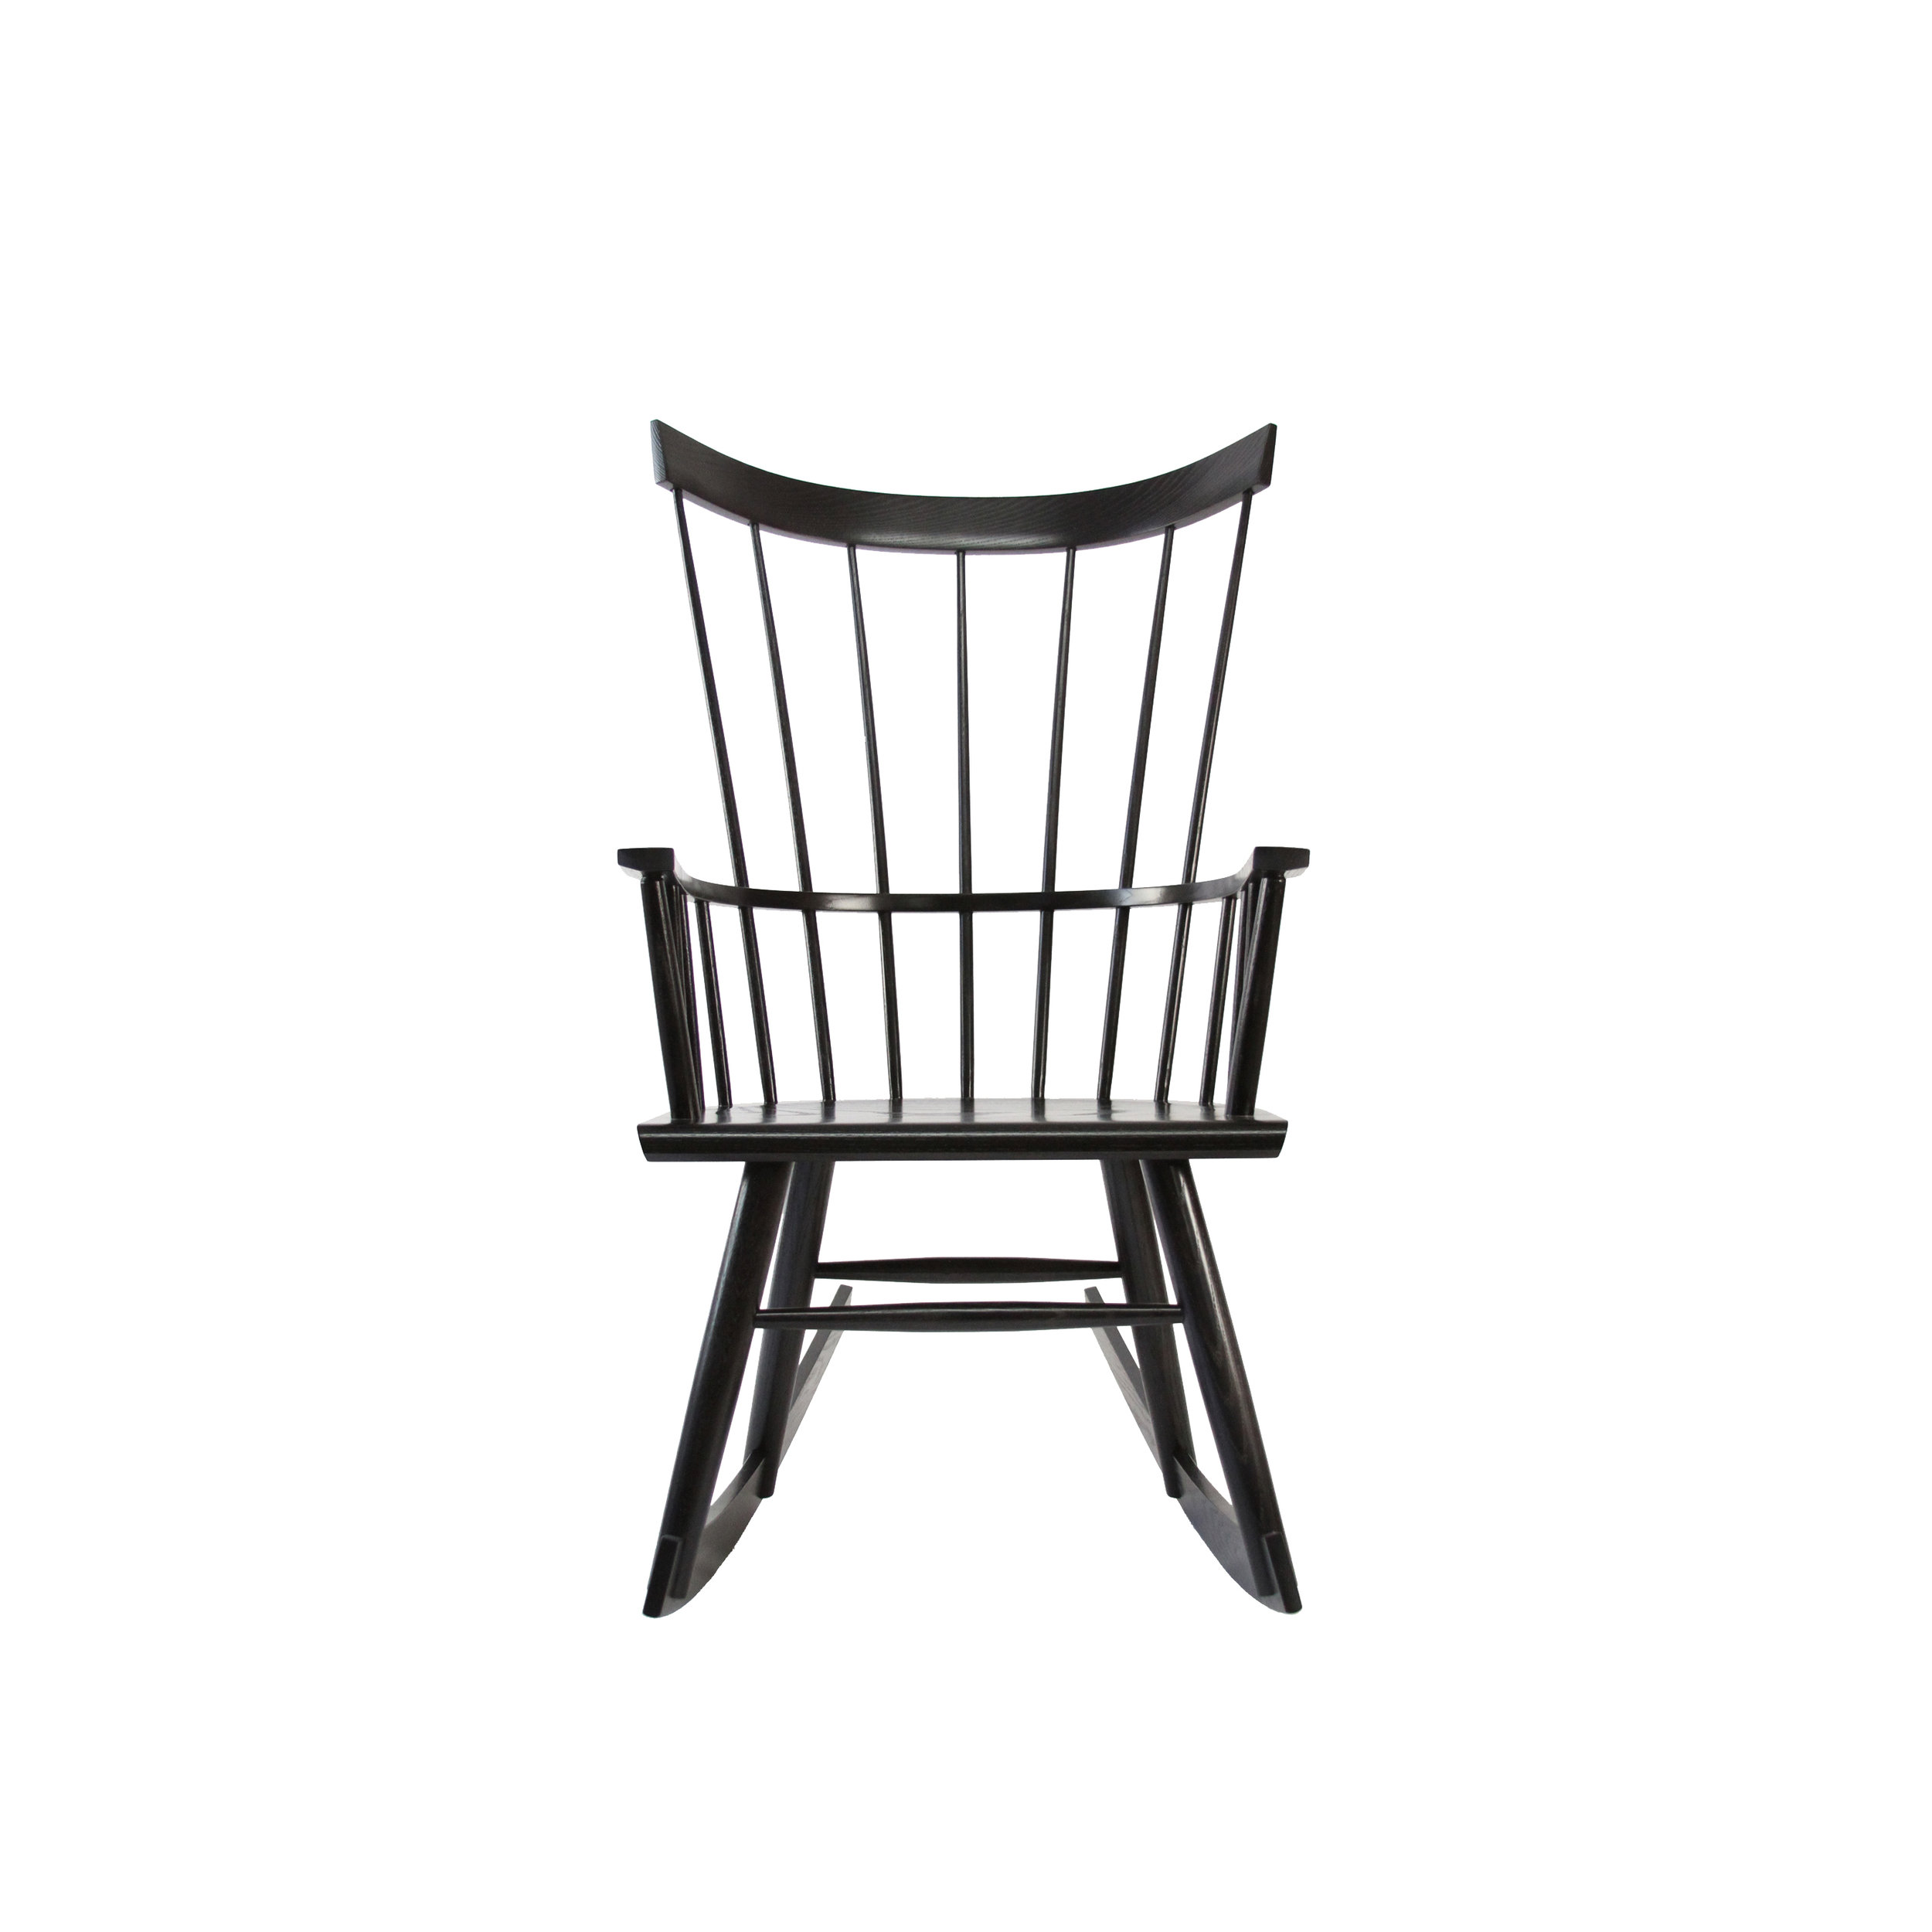 O&G Studio Colt High Back Highback Windsor Contemporary Dining Chair Armchair Large Salt Pond Dark Warm Medium Grey Gray Stain on Maple Rocker Rocking Chair